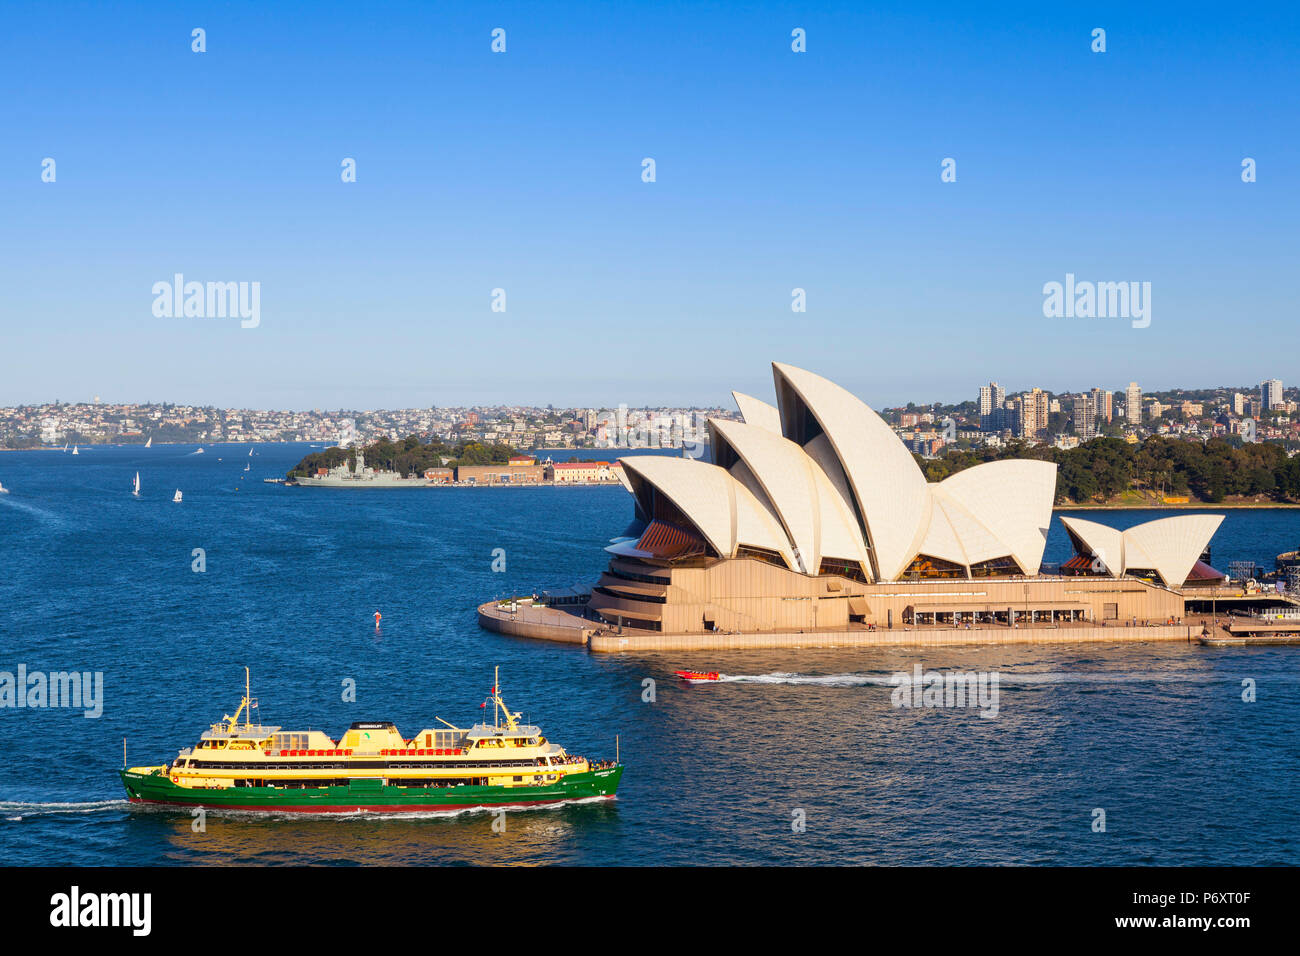 Sydney Opera House, Darling Harbour, Sydney, New South Wales, Australien Stockbild